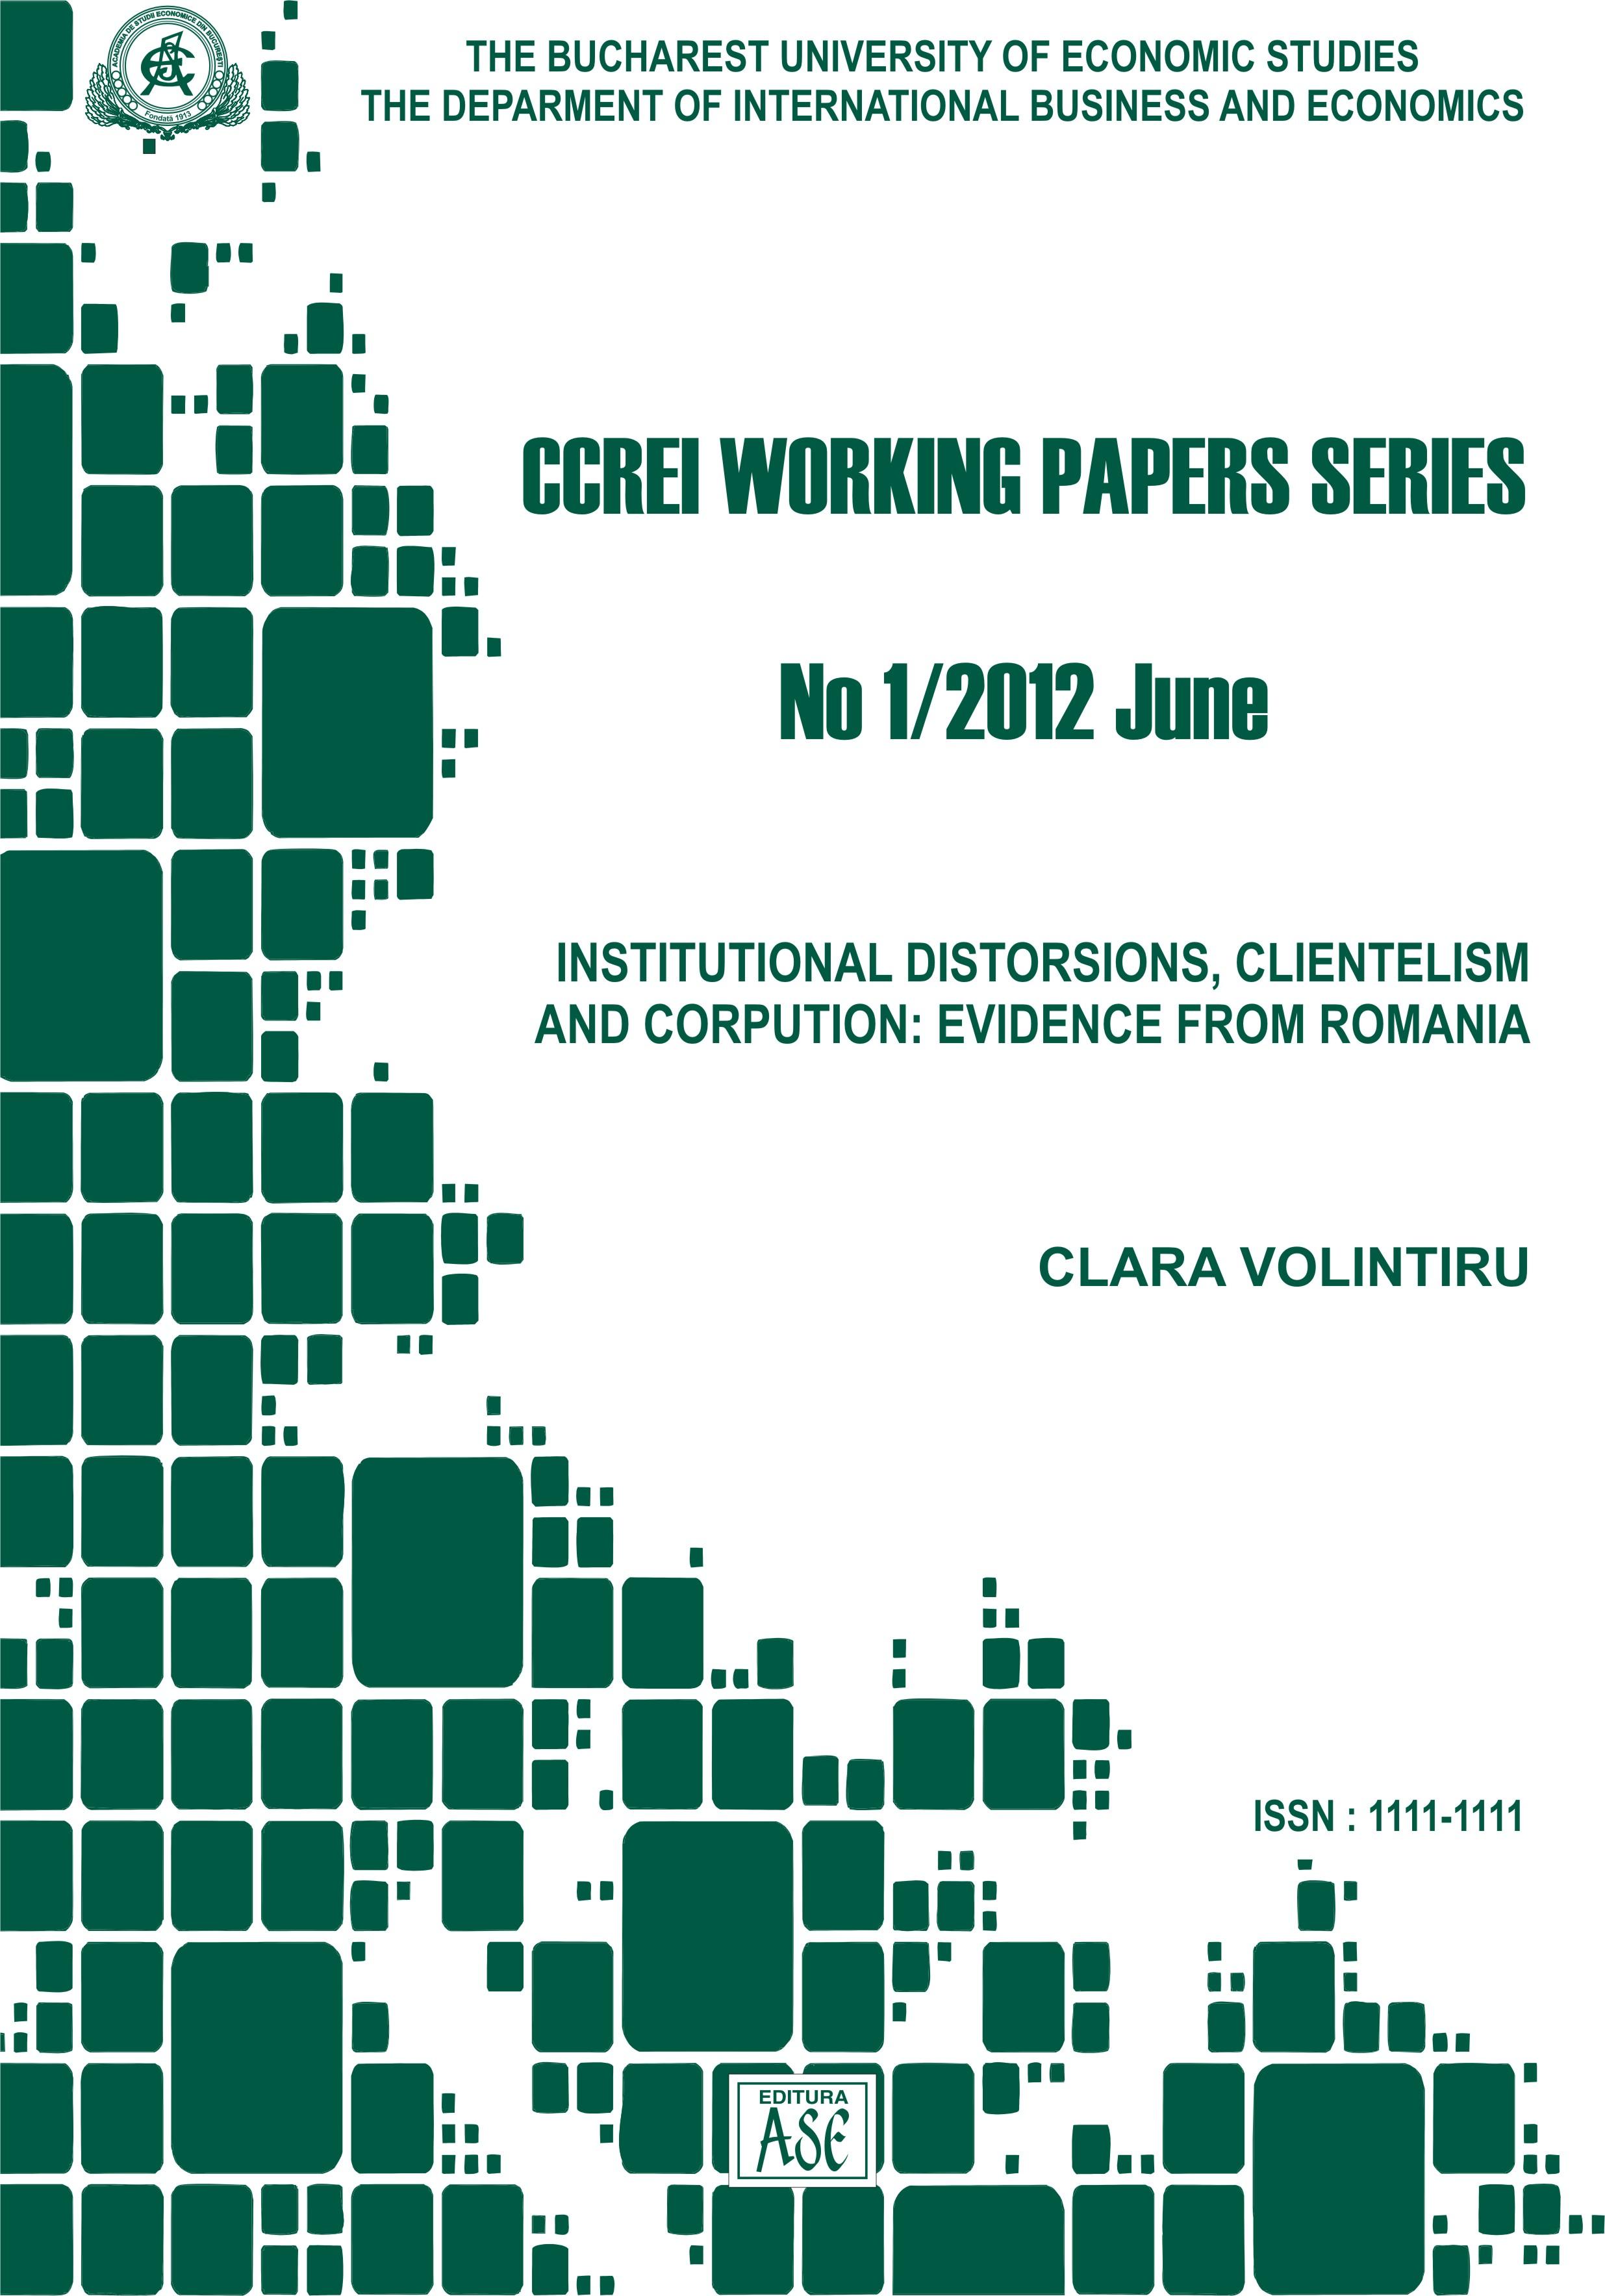 Jurnalul Economic nr. 29